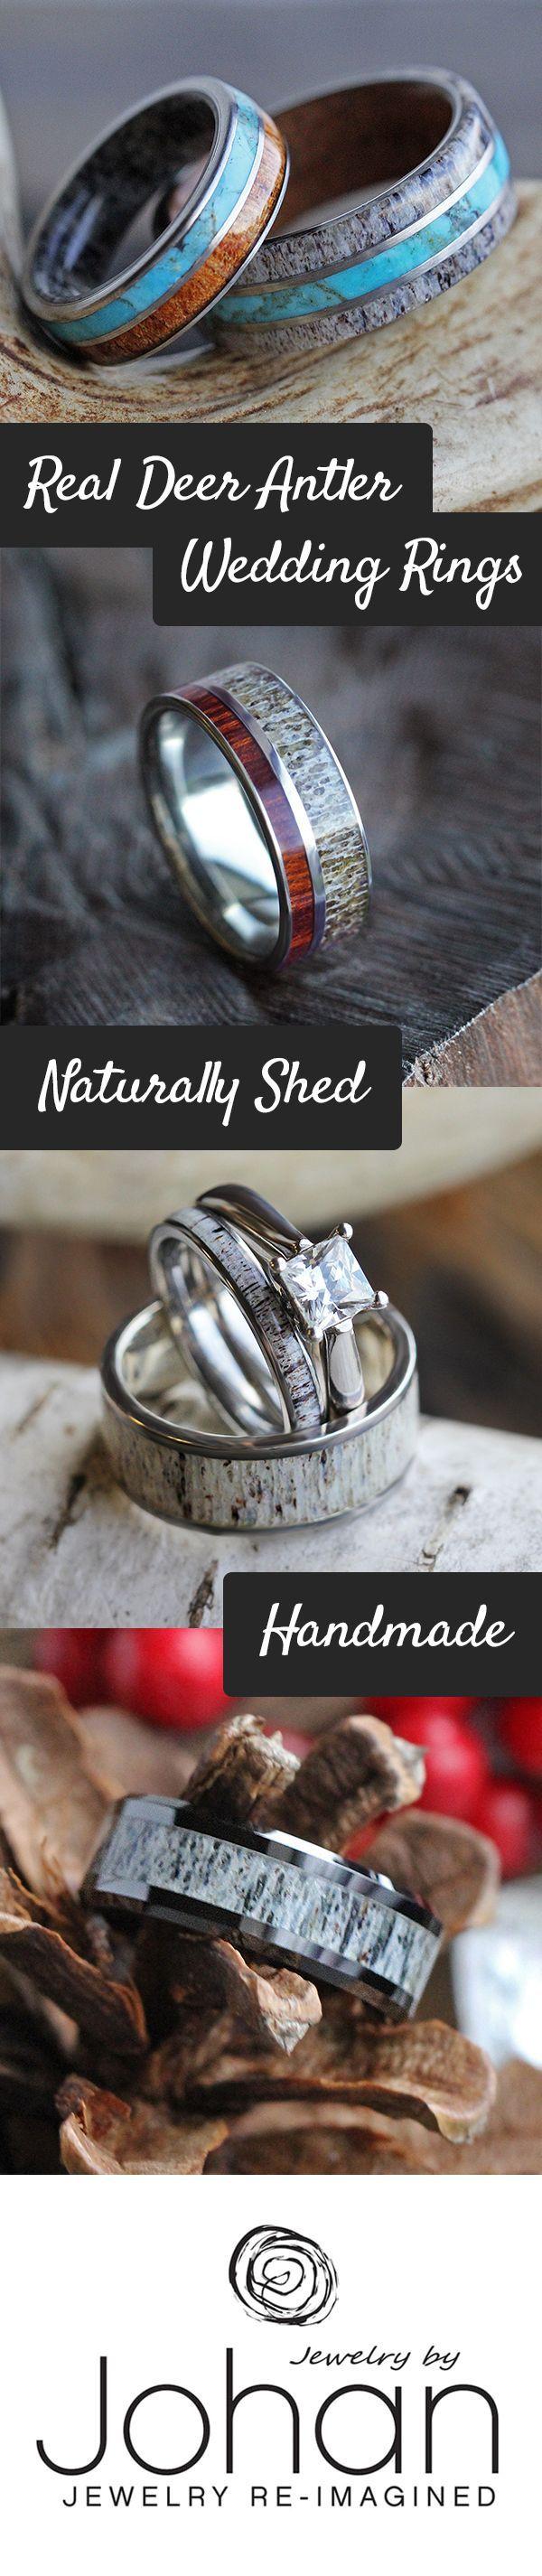 deer antler ring deer wedding bands Natural deer antler wedding rings perfect for outdoor enthusiasts and hunters